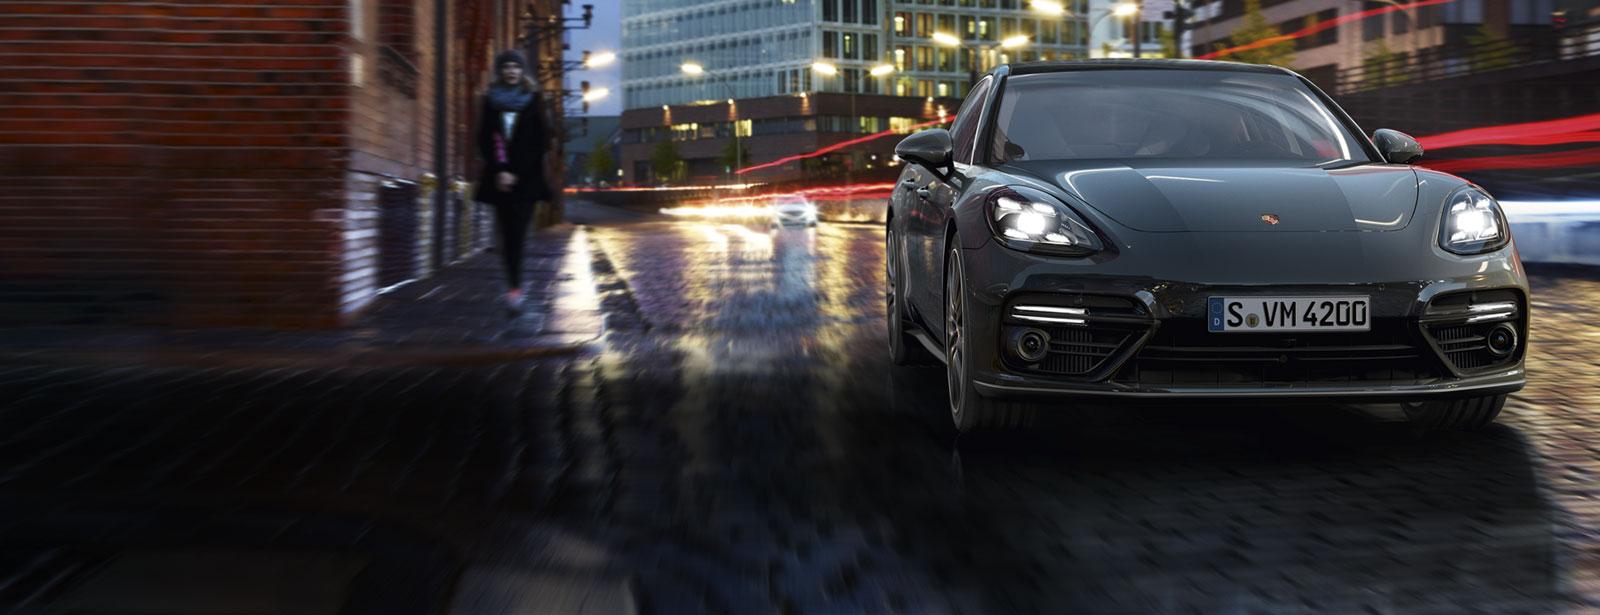 Porsche - Nowa Panamera Turbo